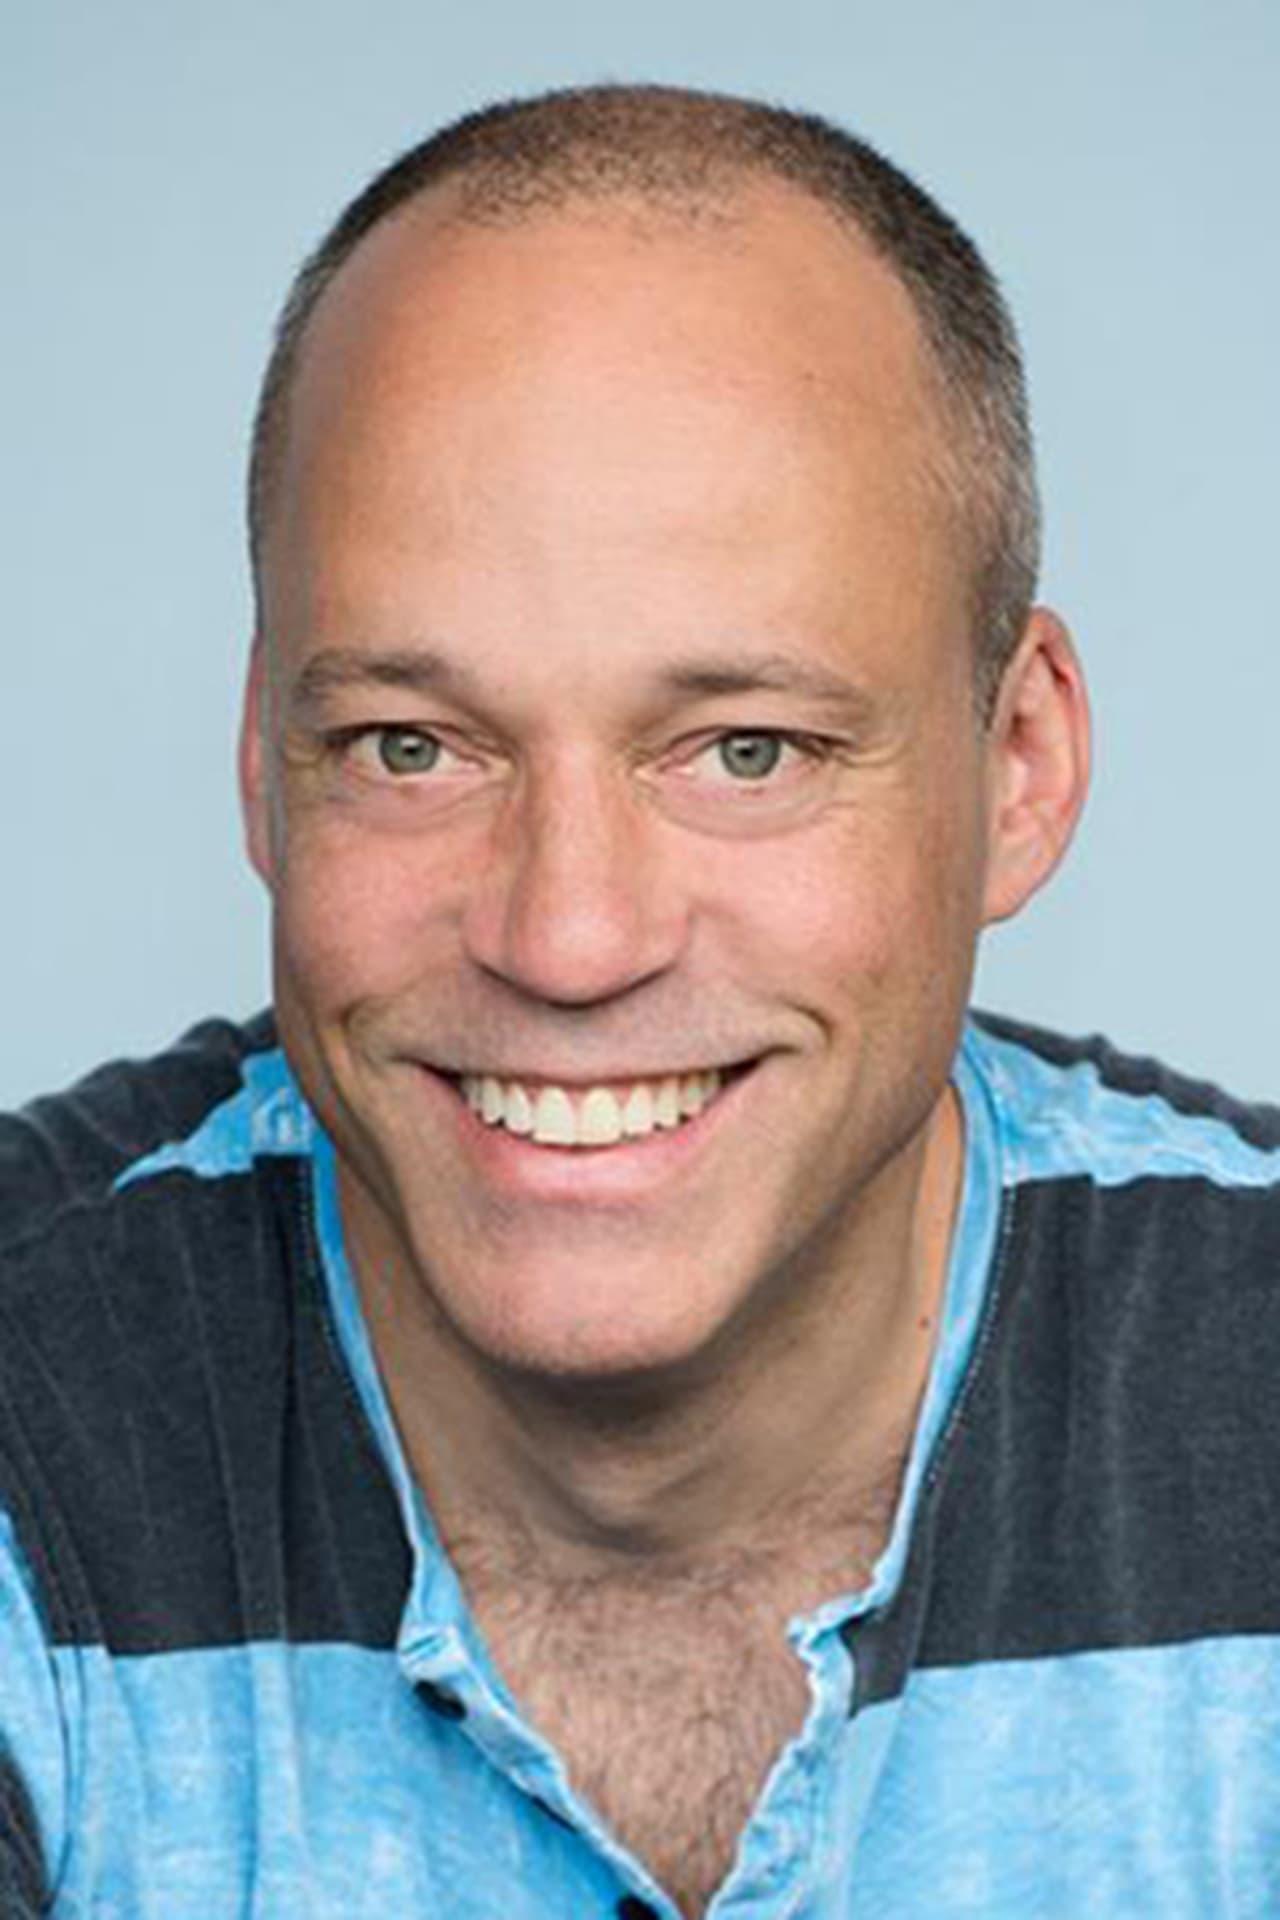 Joël LeMay